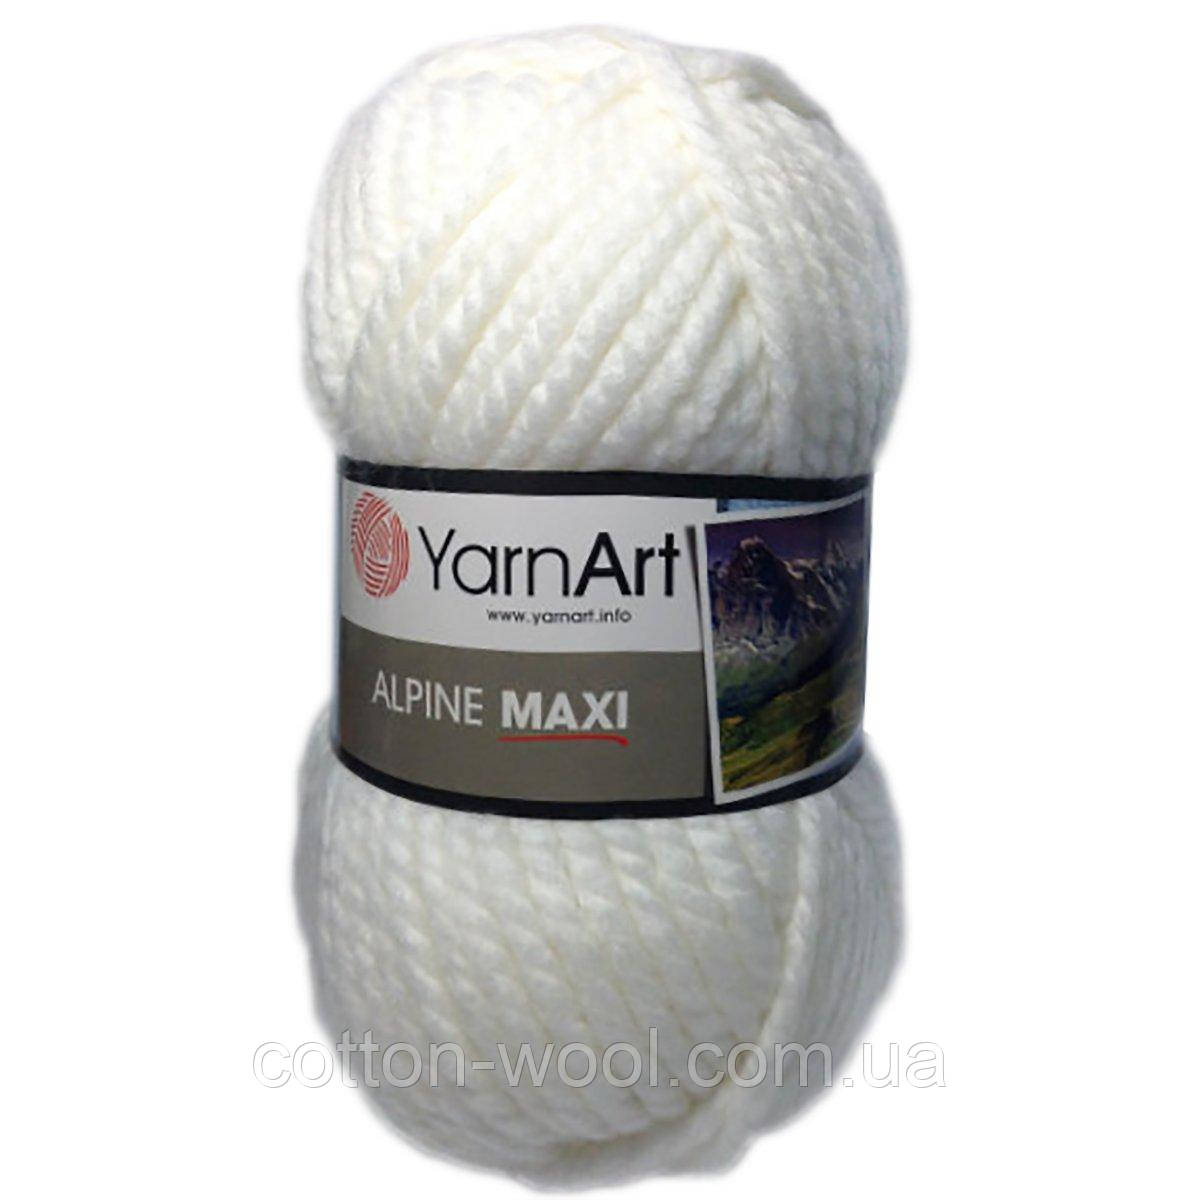 Yarnart Alpine Maxi  (Ярнарт Альпина Макси) 676